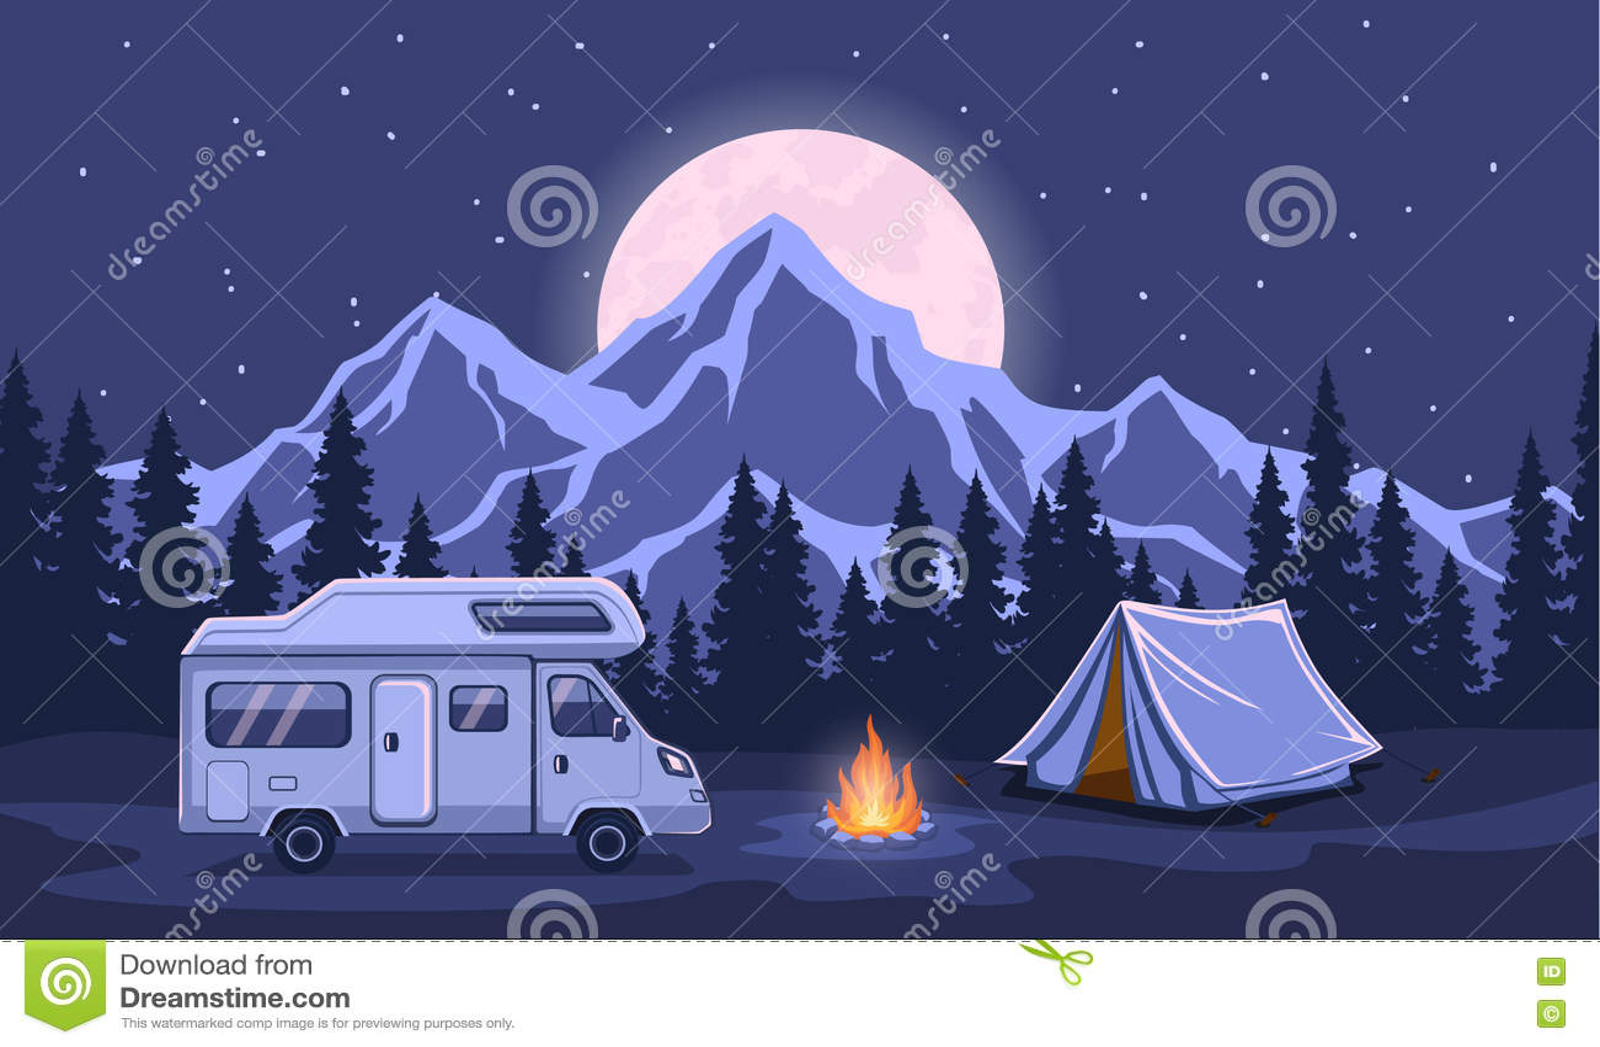 Family Adventure Camping Night Evening Scene